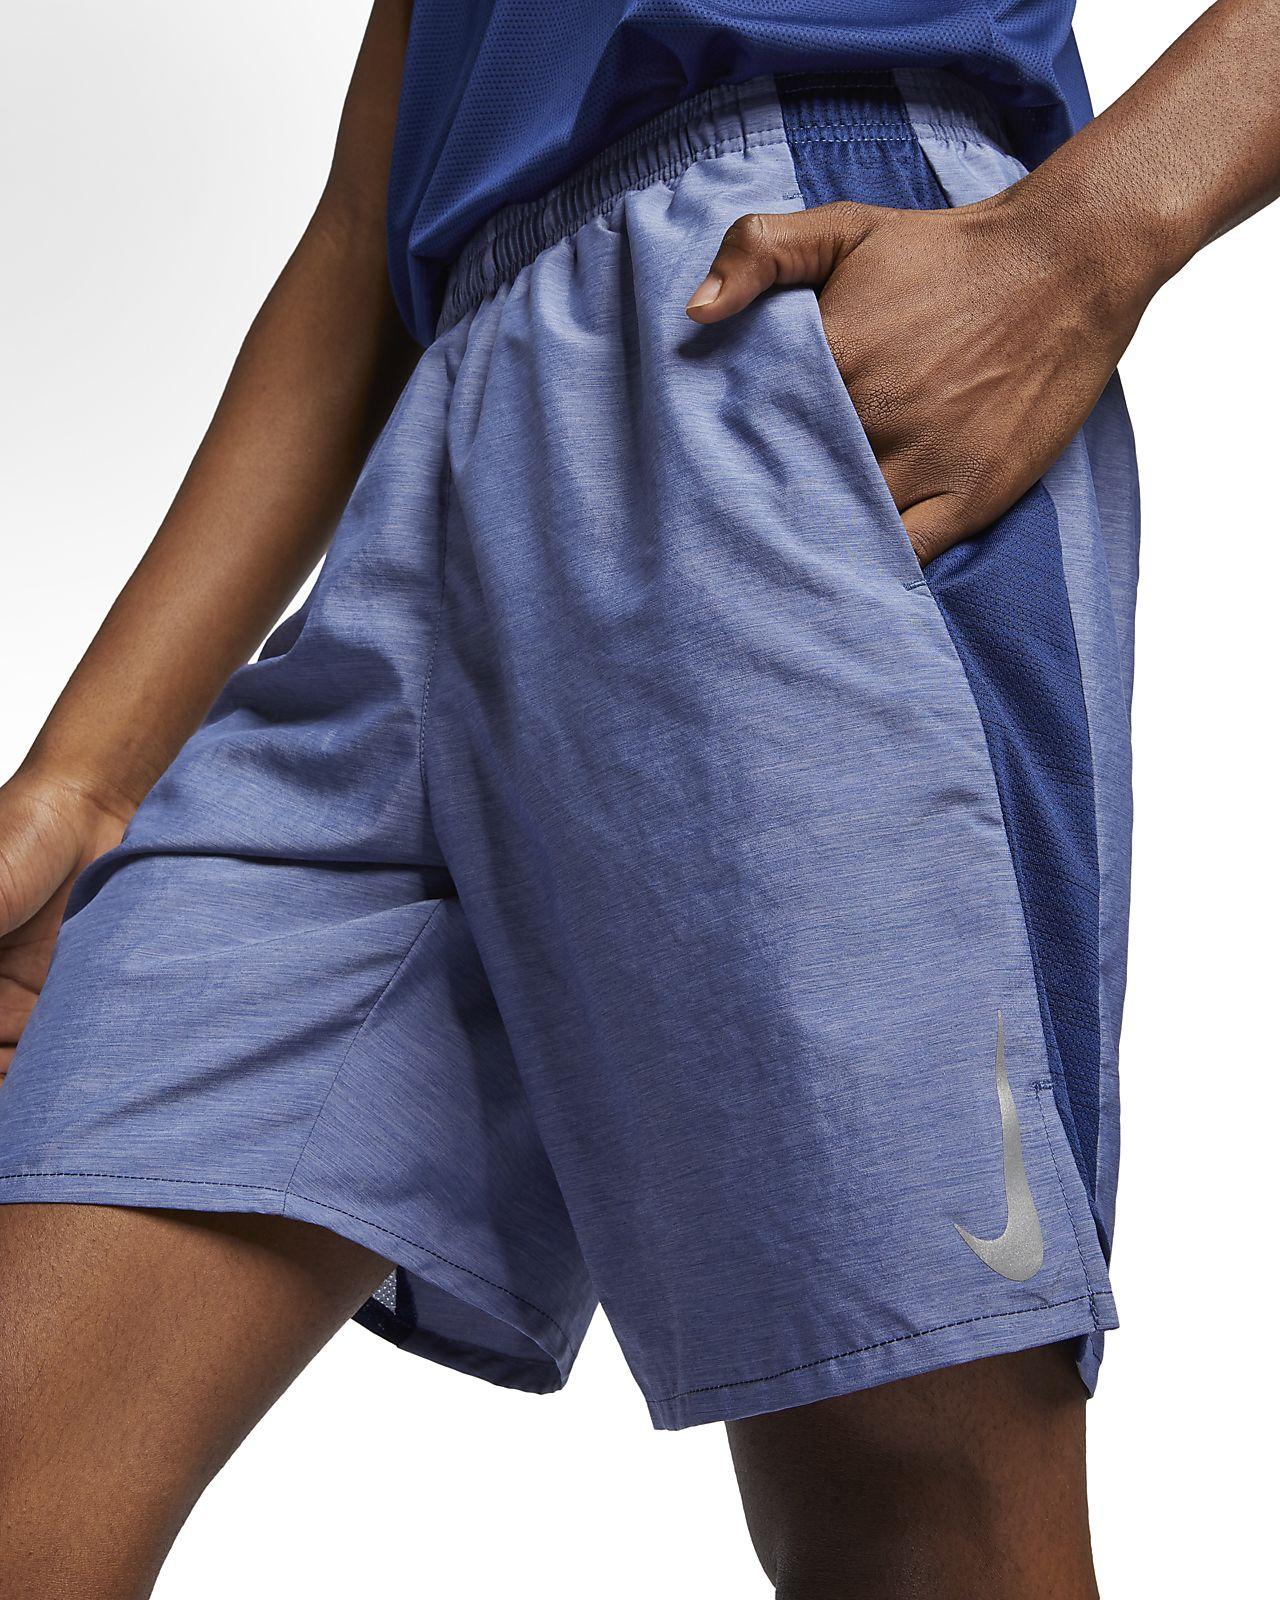 Pour Be De Running Short Challenger Nike Homme qT1IwA